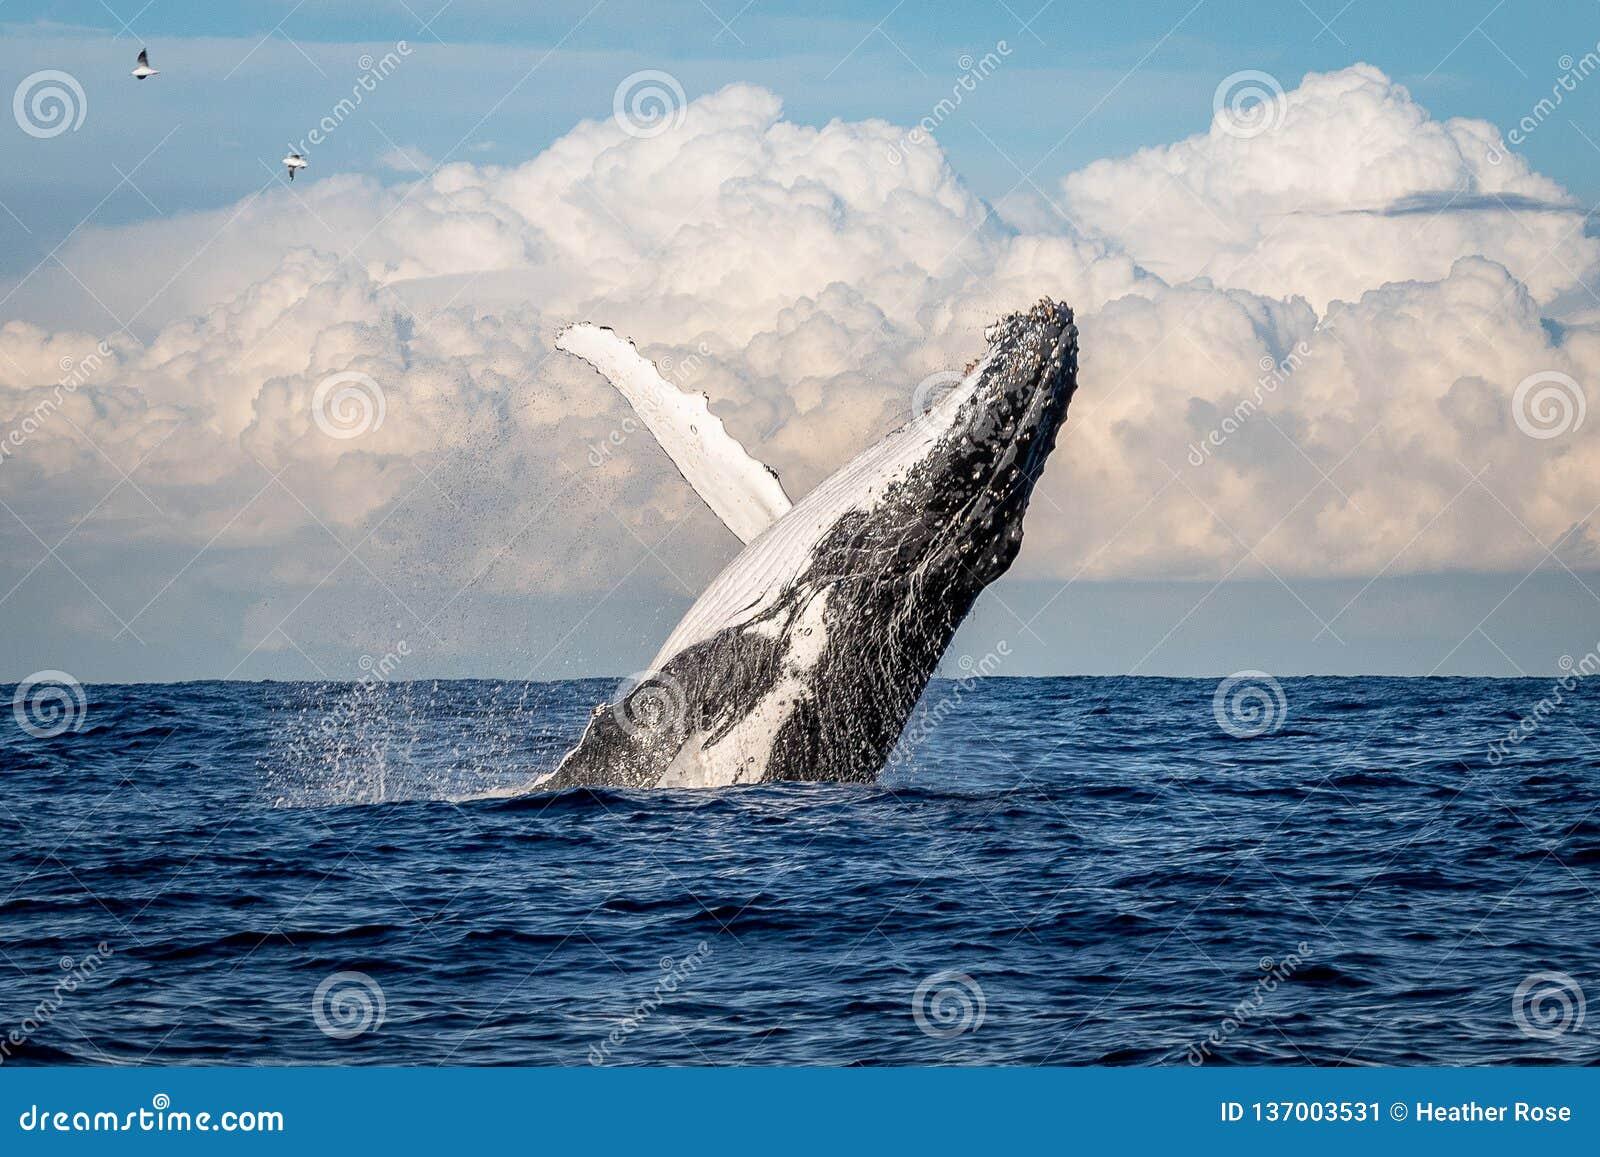 Humpback whale breaching off Manly beach, Sydney, Australia